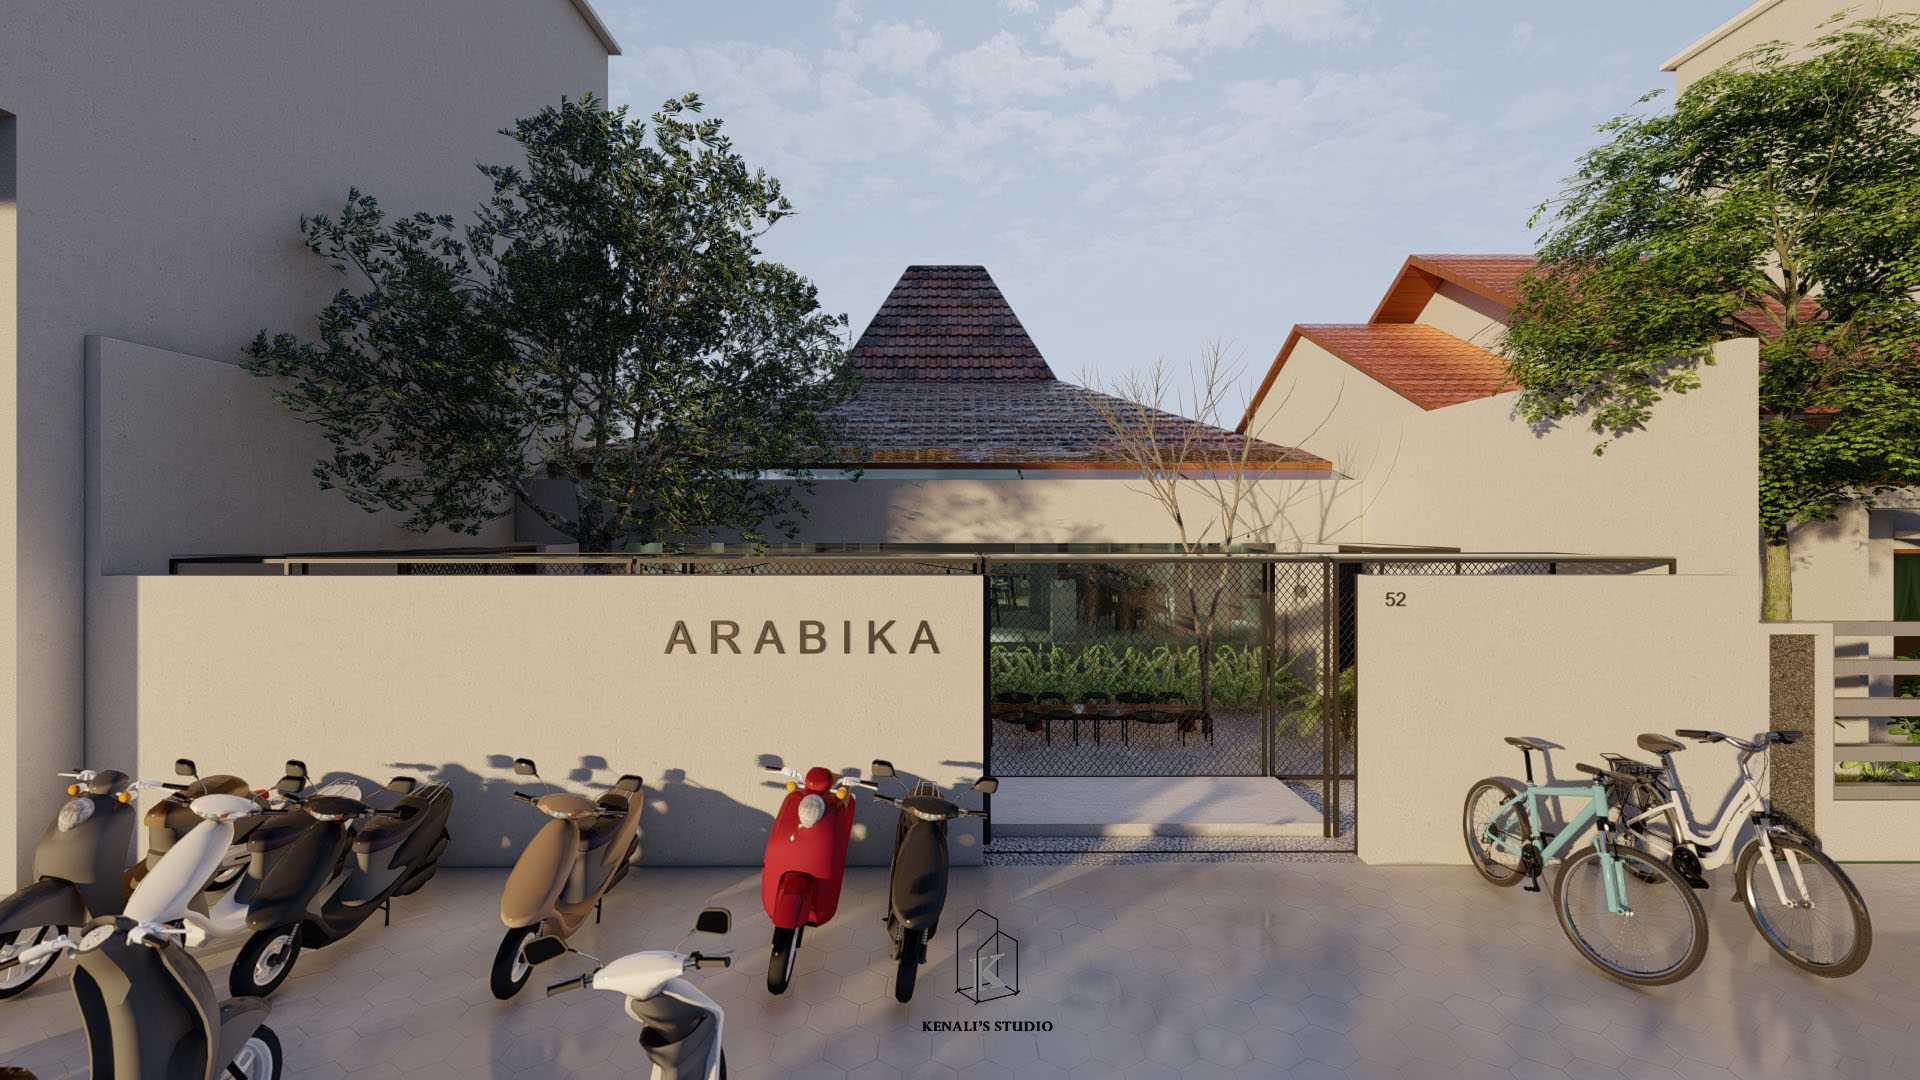 Kenali's Studio Arabika Cafe Semarang, Kota Semarang, Jawa Tengah, Indonesia Semarang, Kota Semarang, Jawa Tengah, Indonesia Kenalis-Studio-Arabika-Cafe  93652